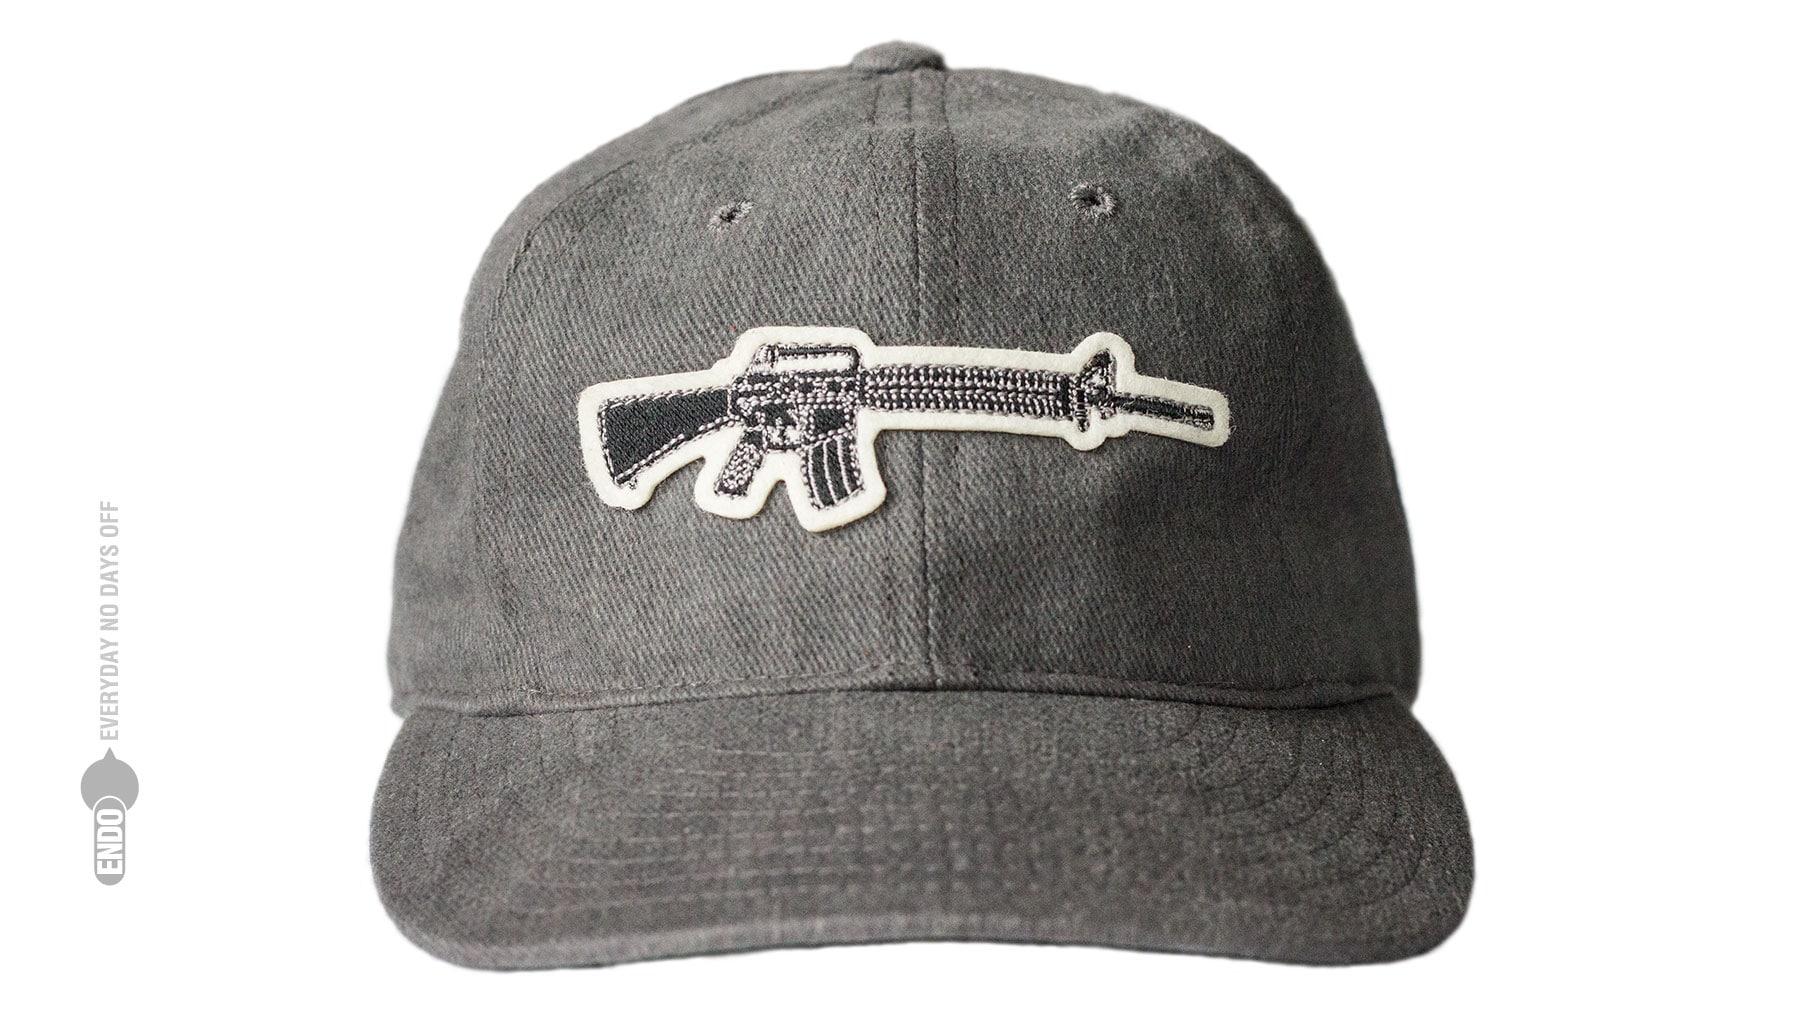 M16-Rifle-Grey-Twill-Hat-Main